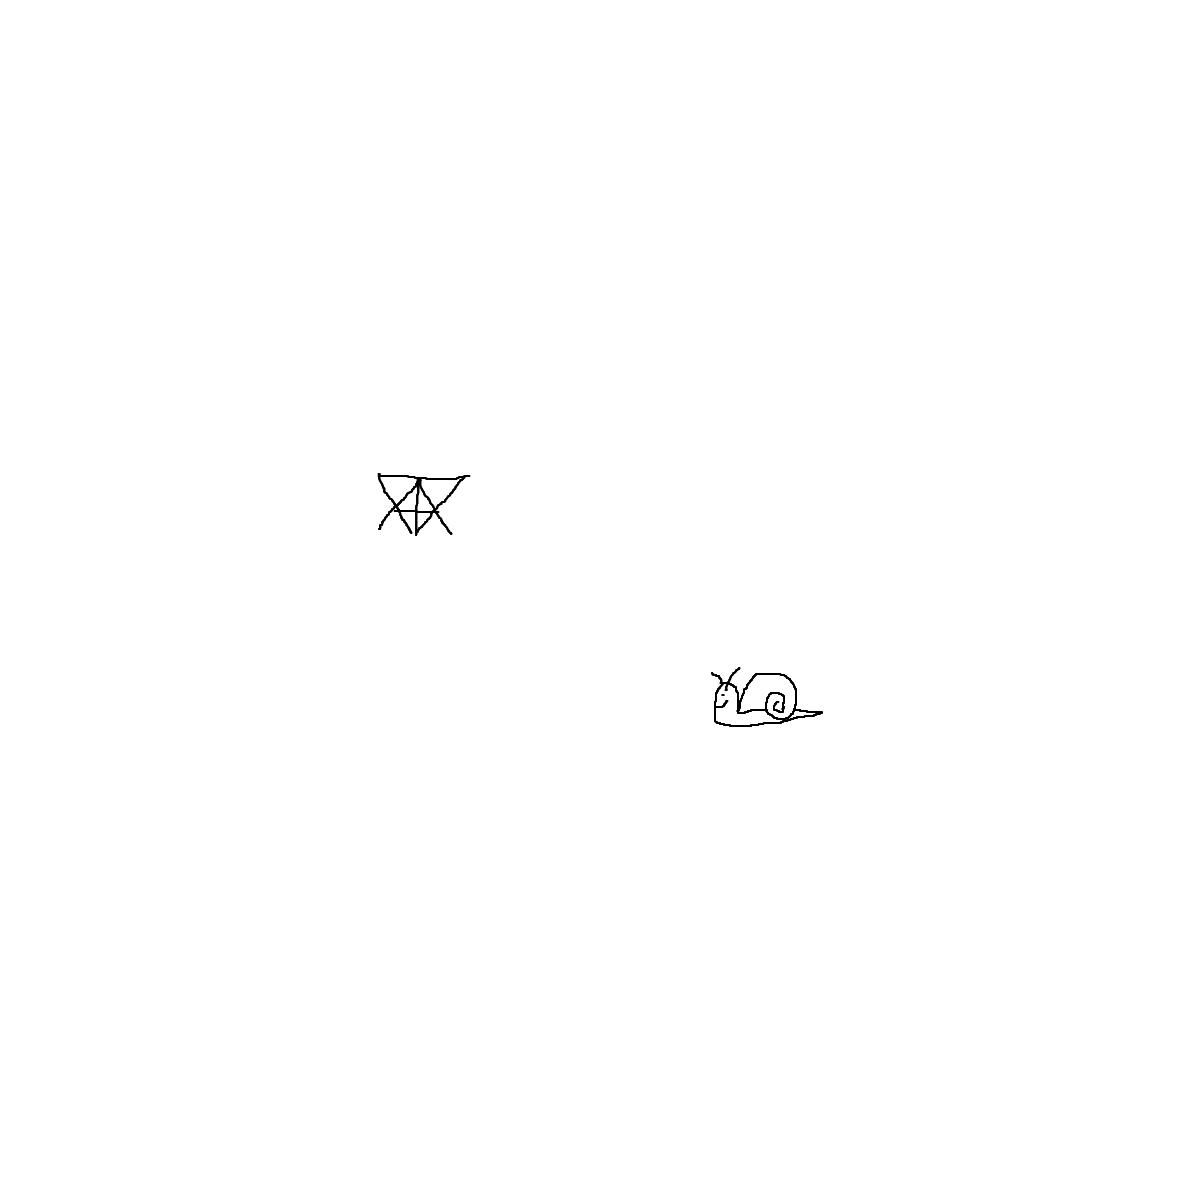 BAAAM drawing#1434 lat:30.4516906738281250lng: -97.6248703002929700